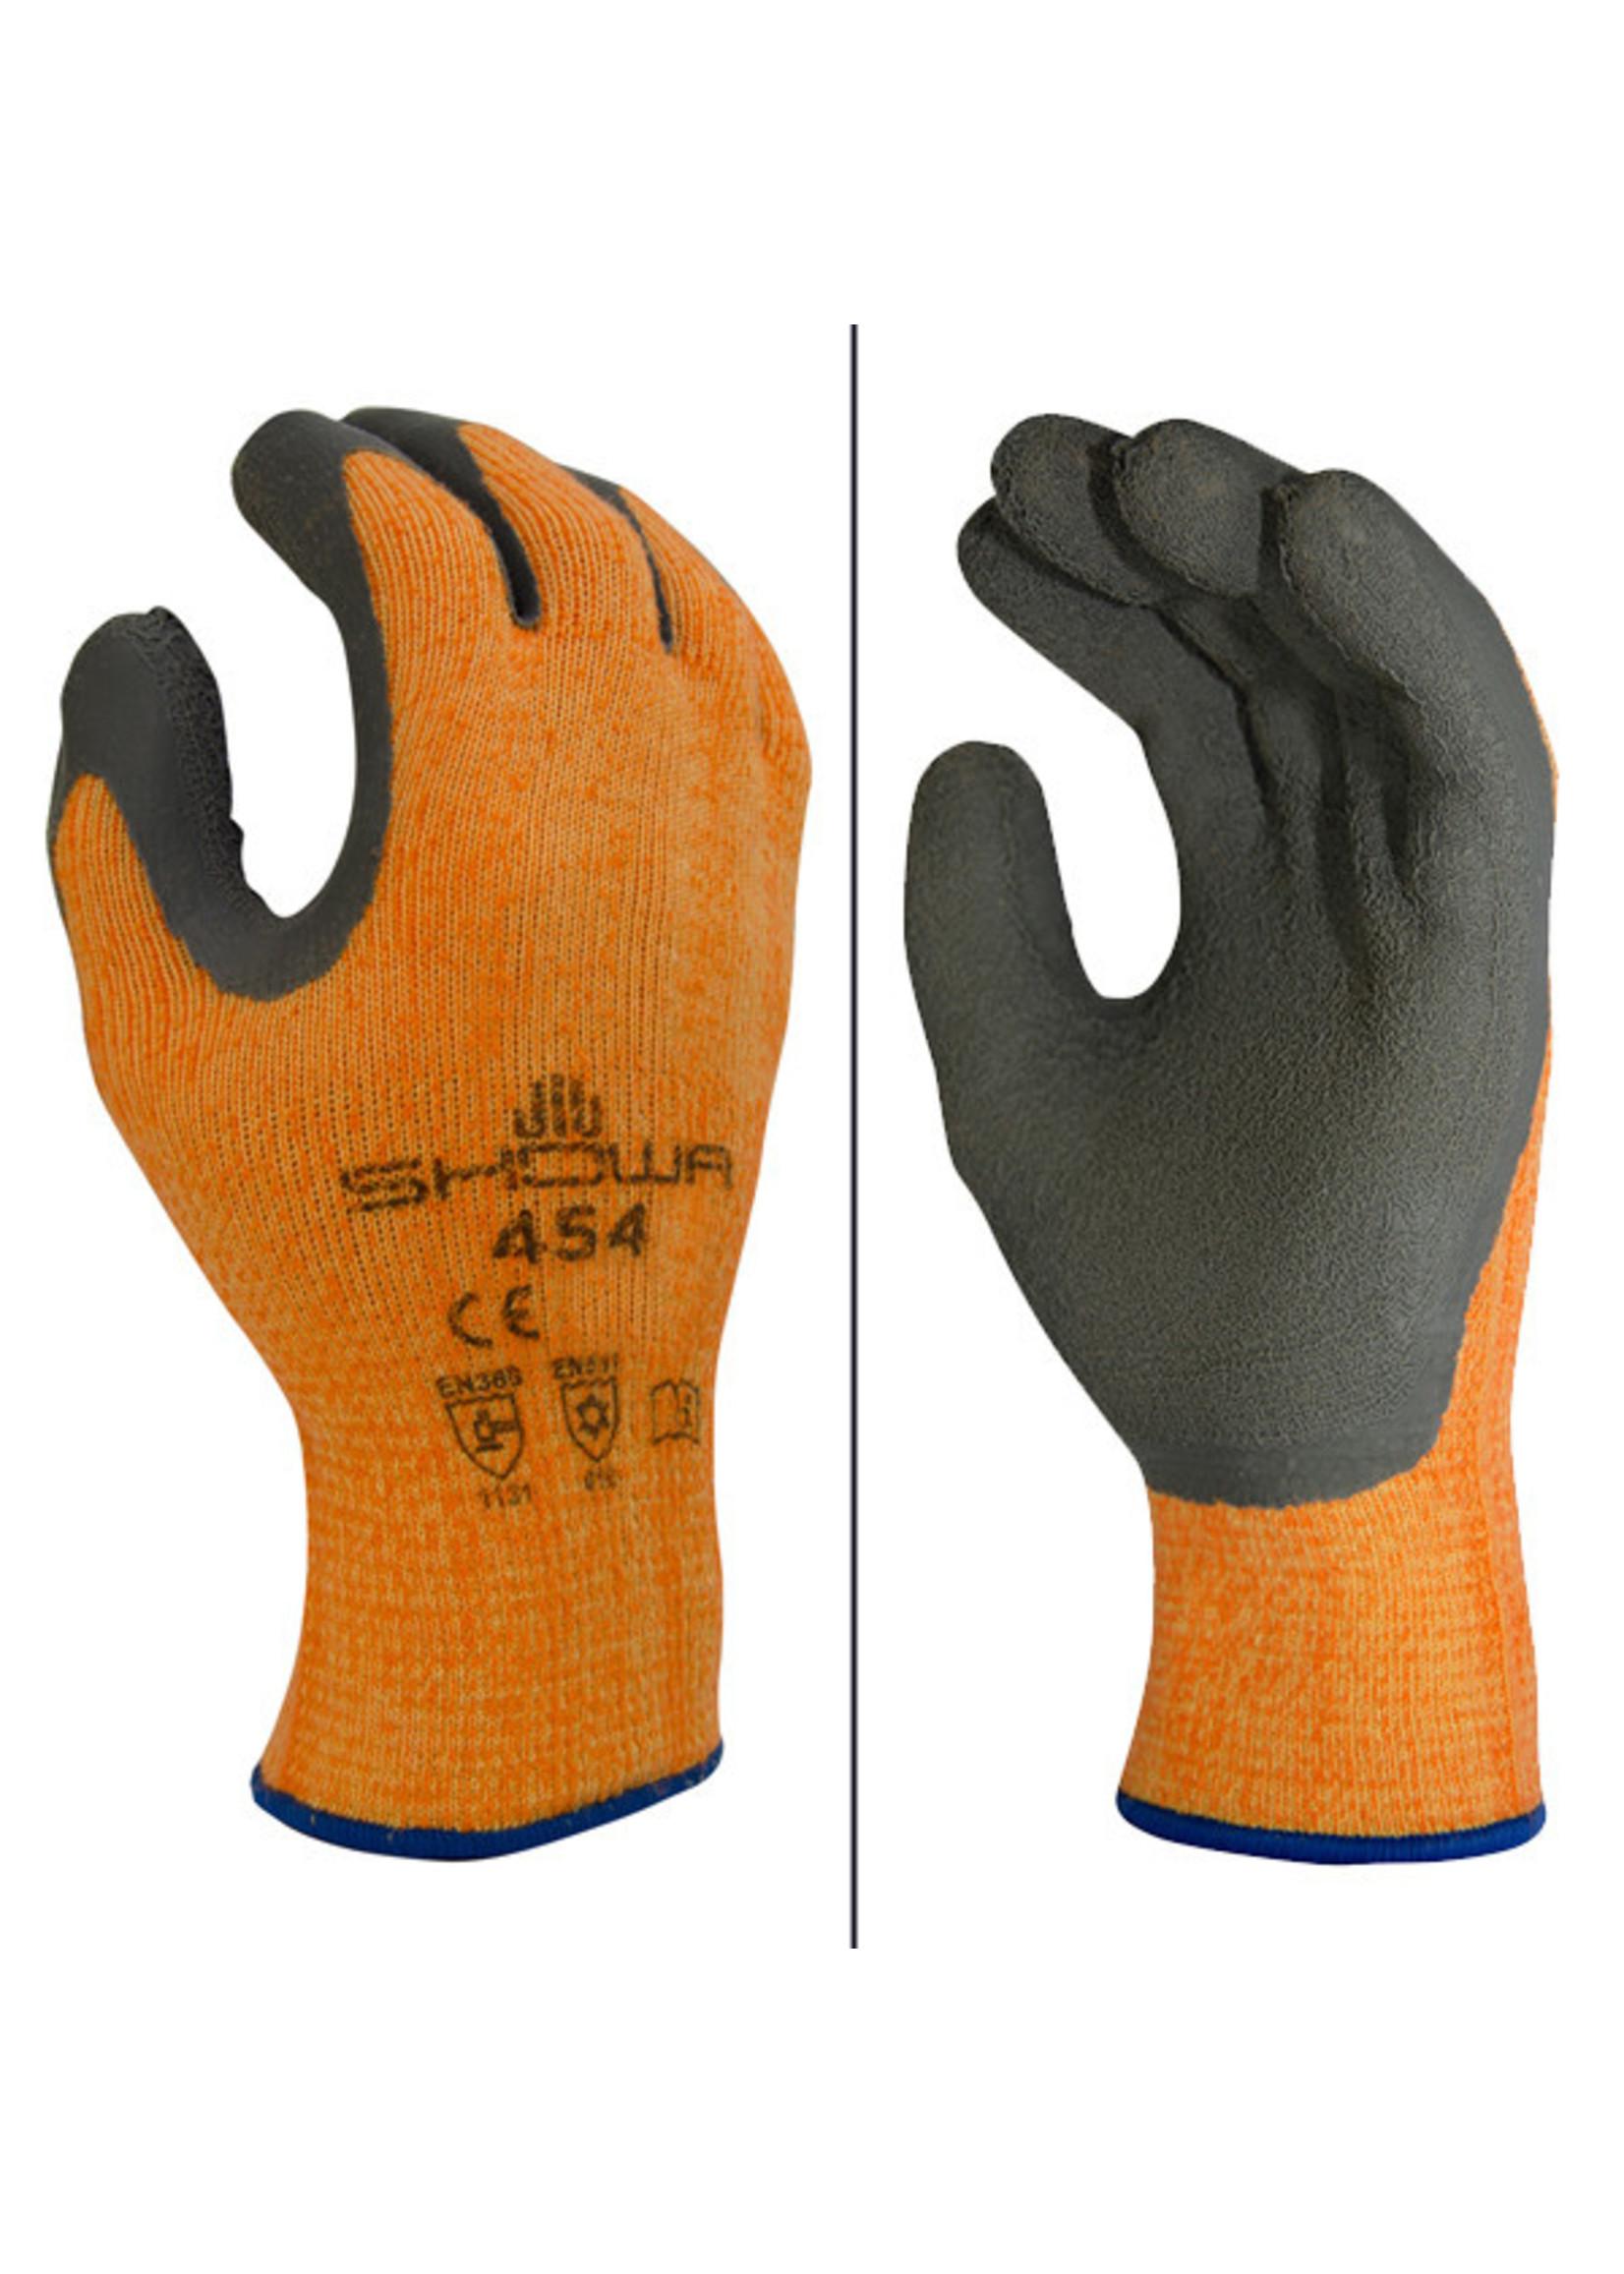 Atlas Gloves GLOVE INSULATED 454